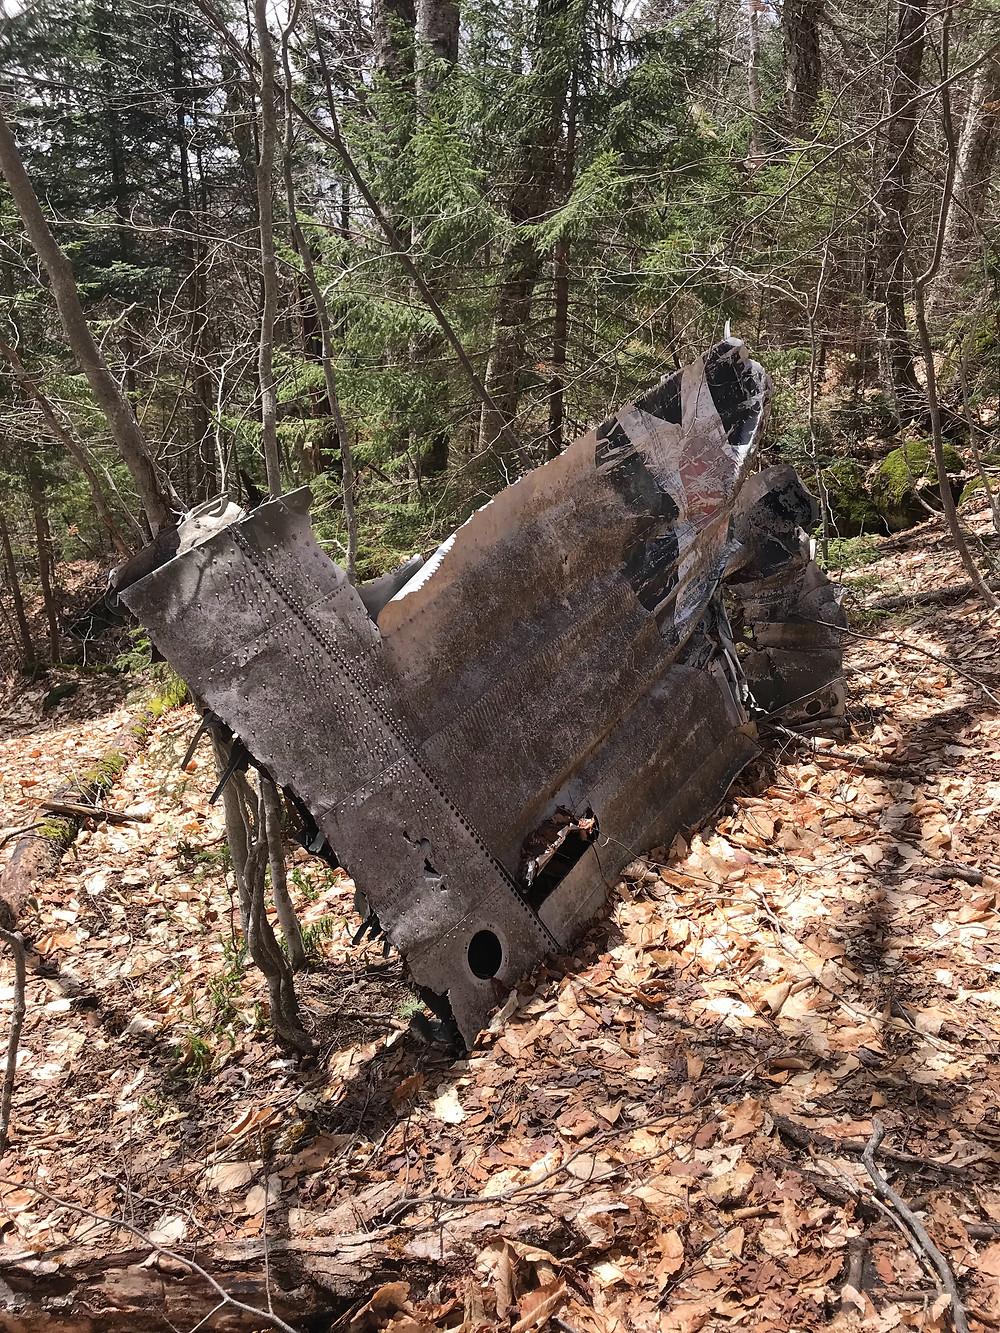 B18 Bomber, Crash site, b18 bomber crash site, hiking, woodstock nh, beauty, outdoors, plane wing